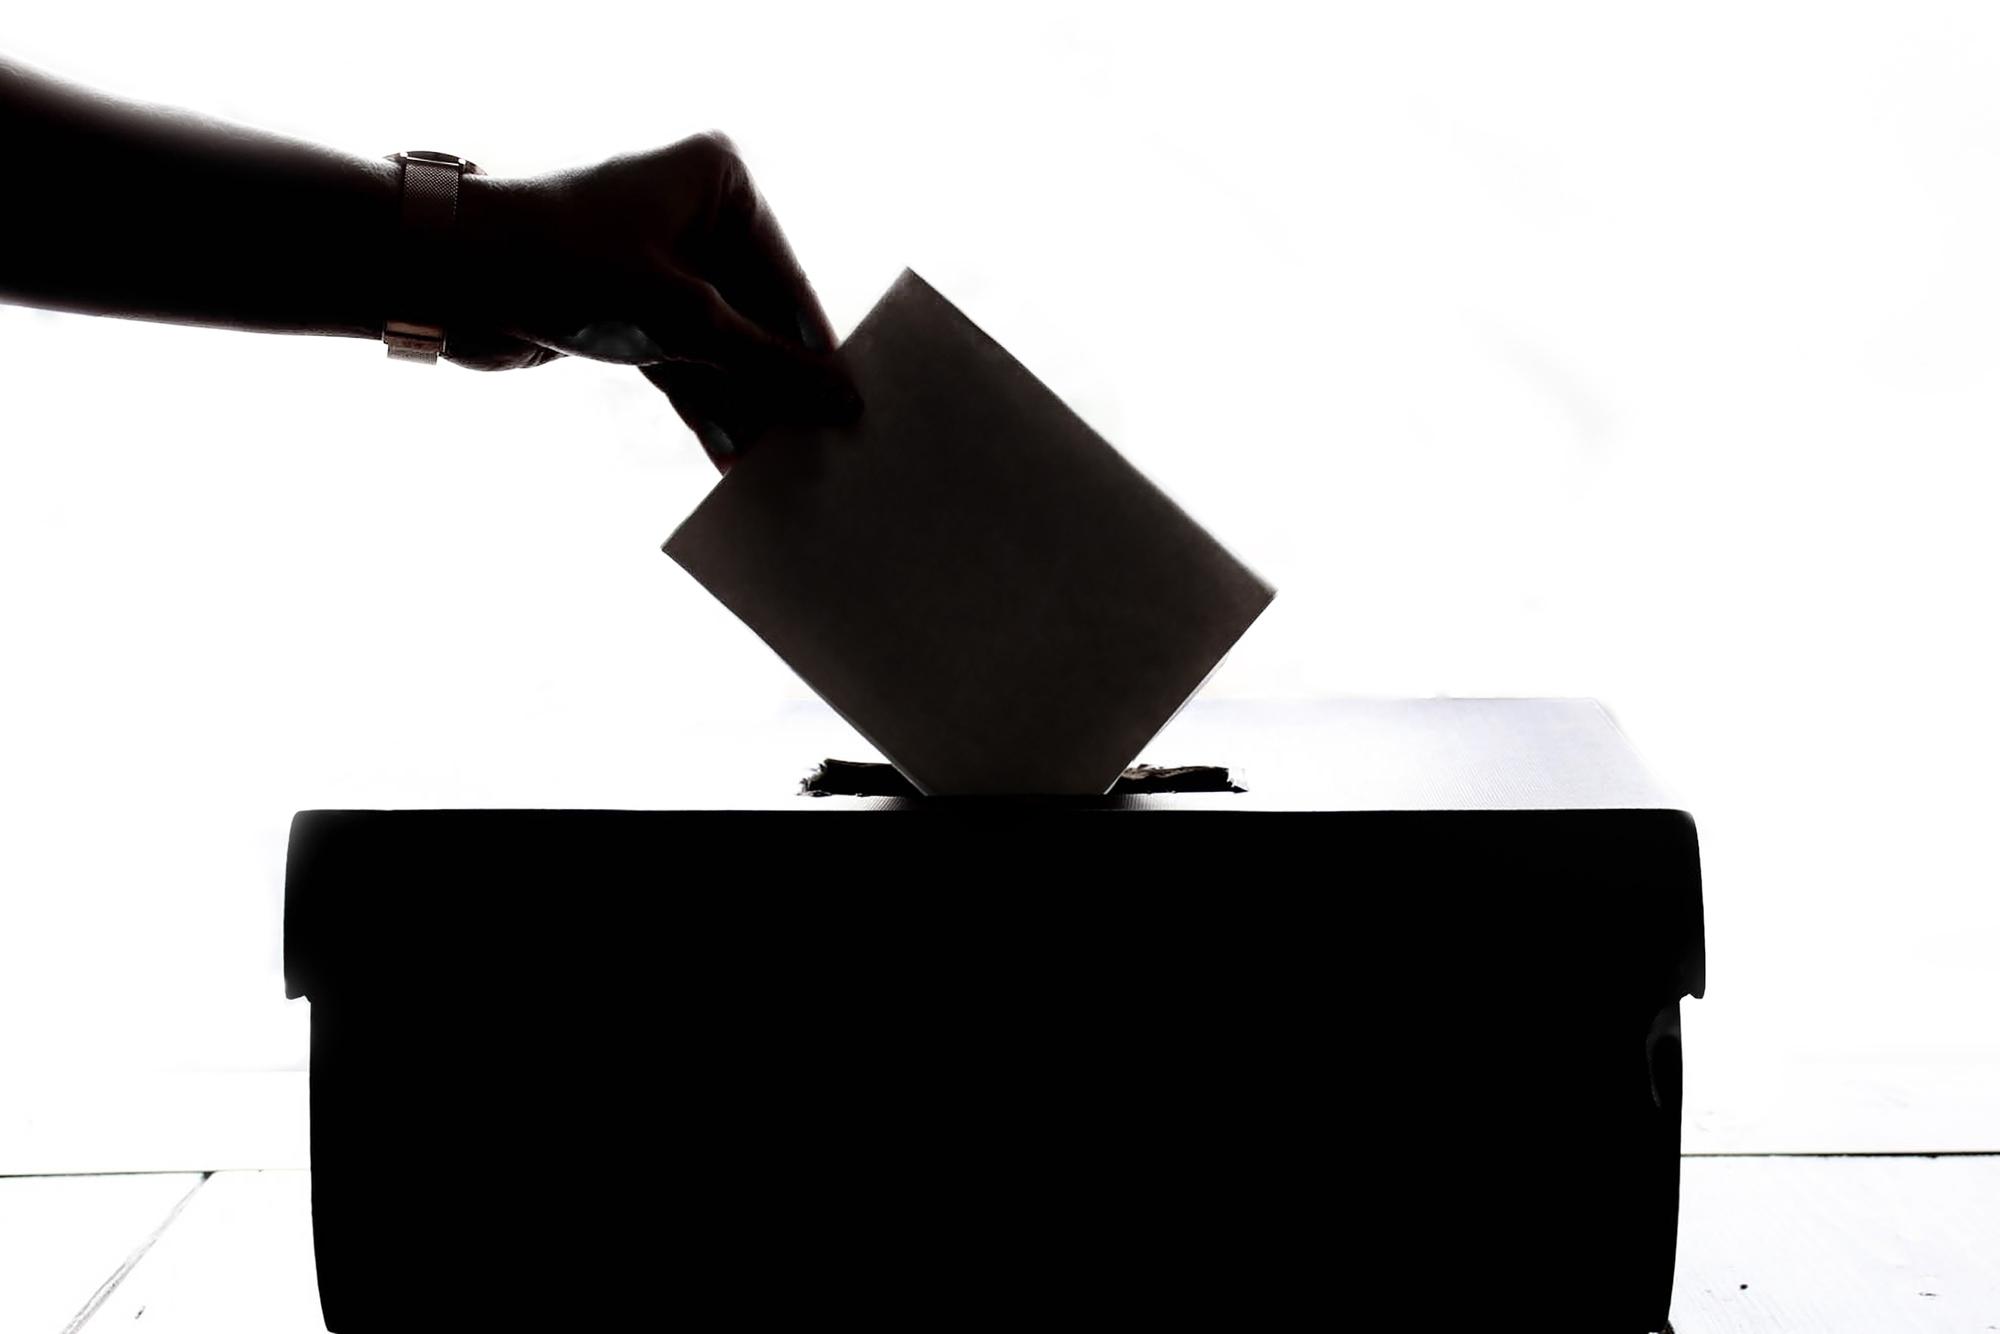 Hal yang Patut Diketahui Sebelum Coblos di Pemilu 2019